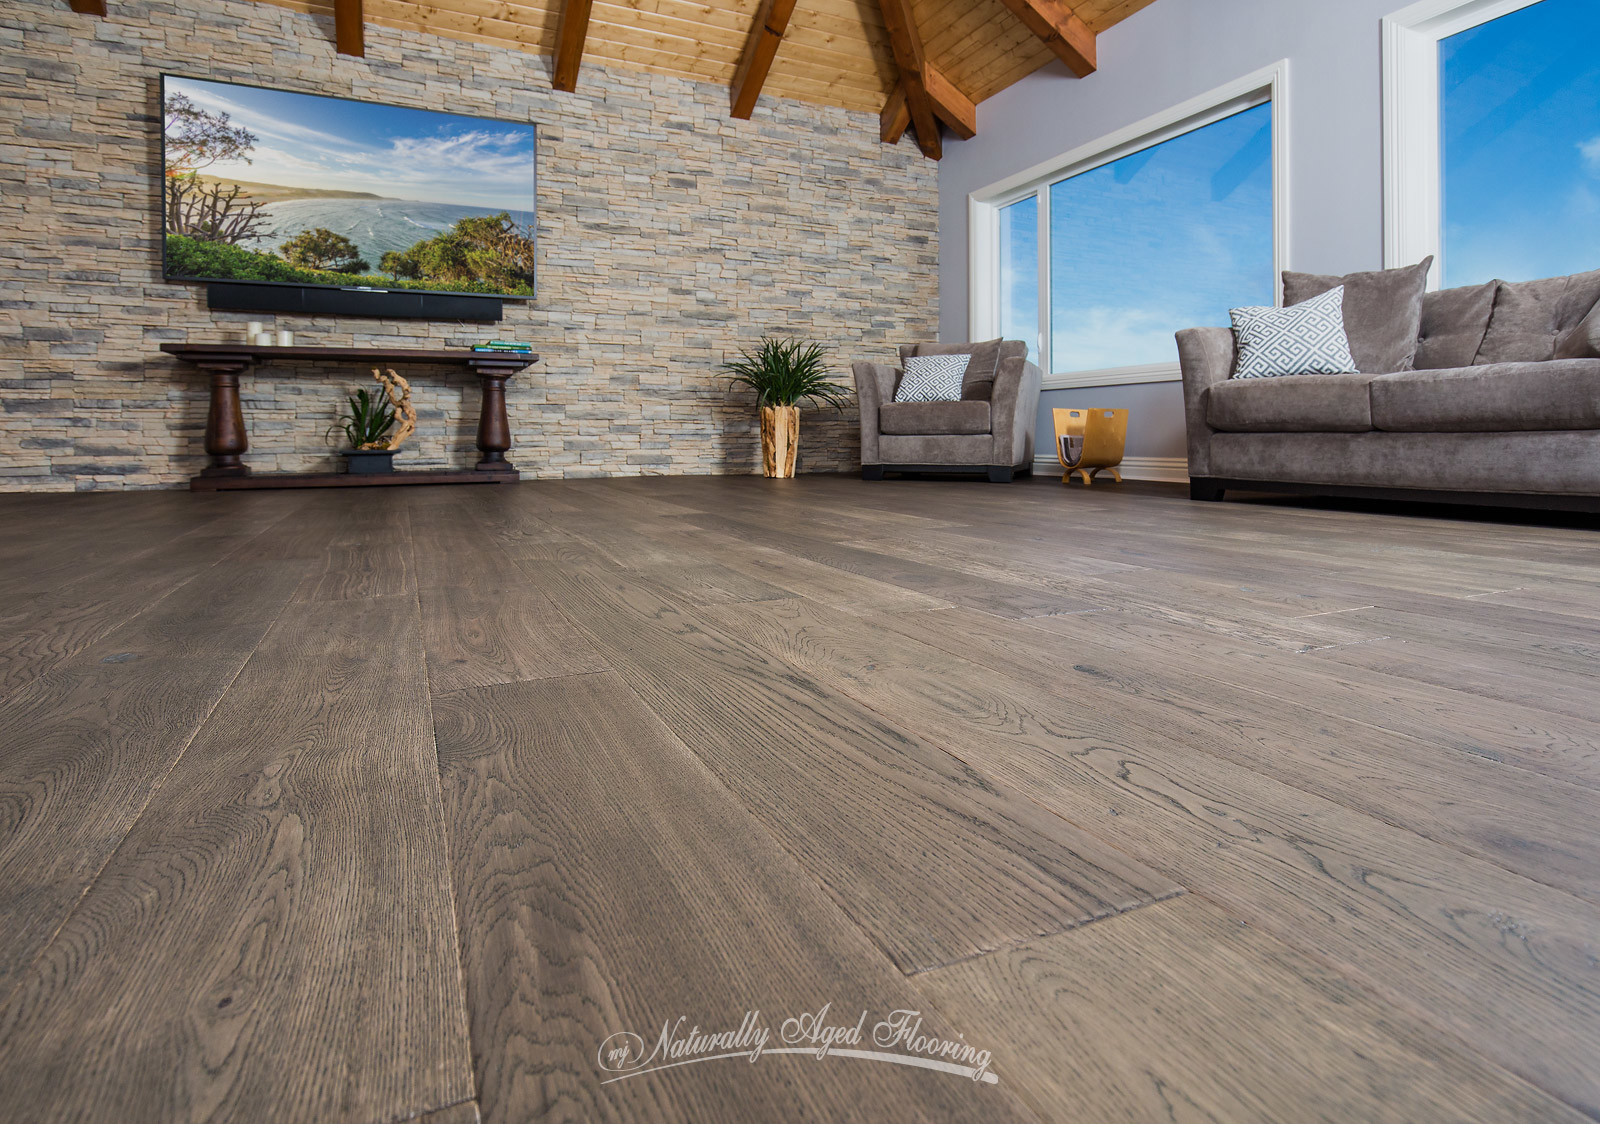 29 Stylish Canadian Birch Hardwood Flooring 2021 free download canadian birch hardwood flooring of wirebrushed series naturally aged flooring inside nightfall